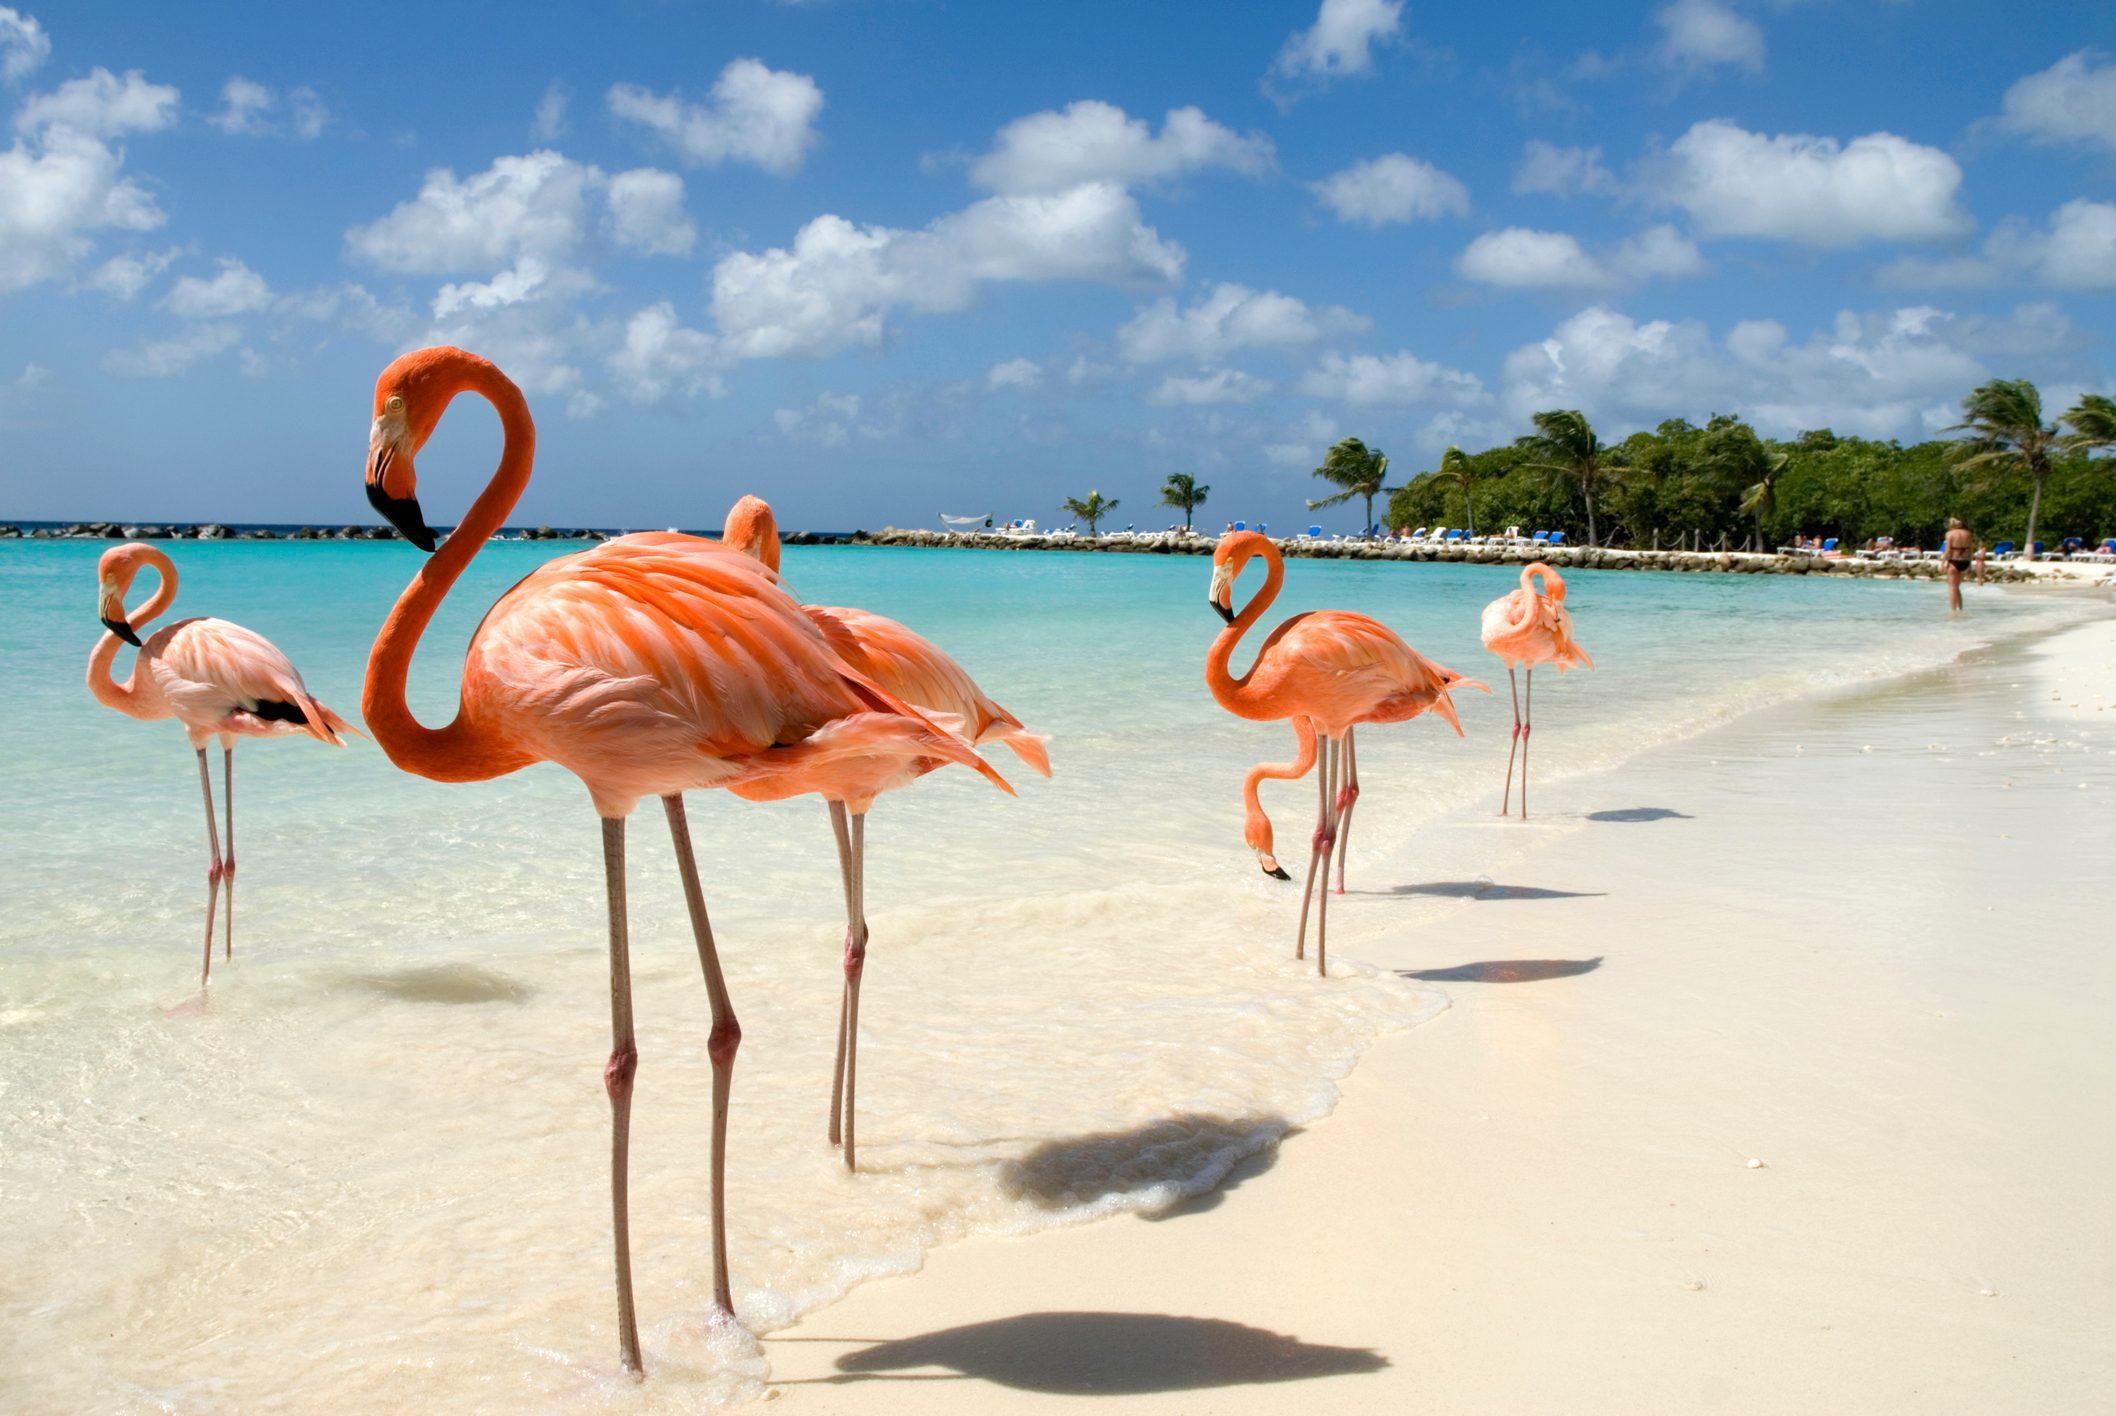 Flamingos on the Beach